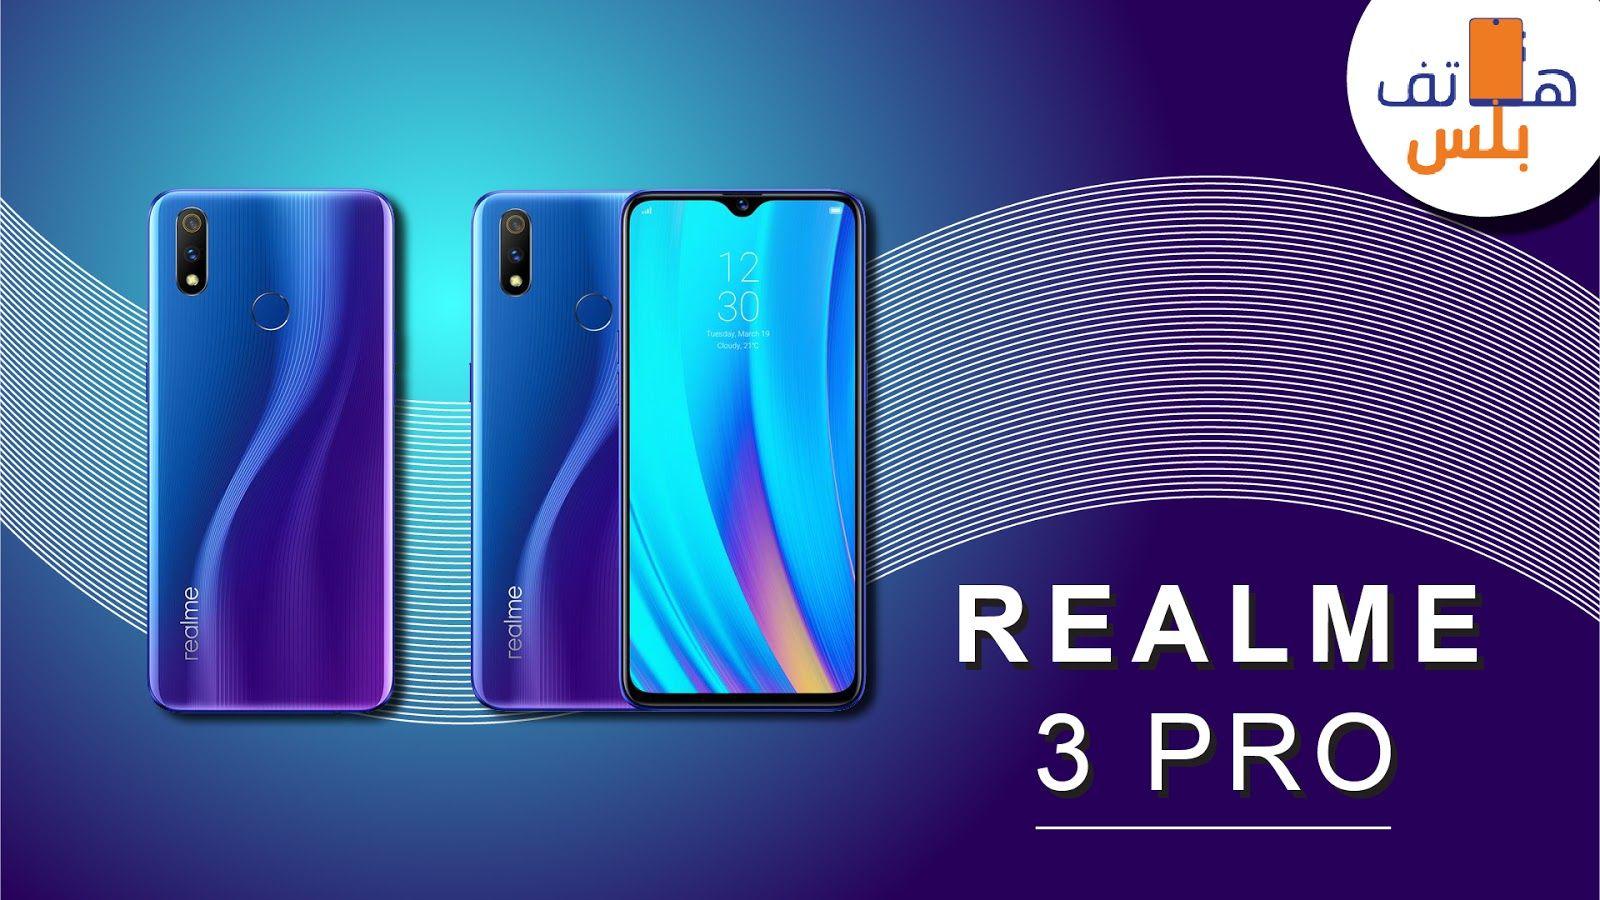 مواصفات هاتف Realme 3 Pro ريلمي 3 برو Galaxy Phone Samsung Galaxy Phone Samsung Galaxy